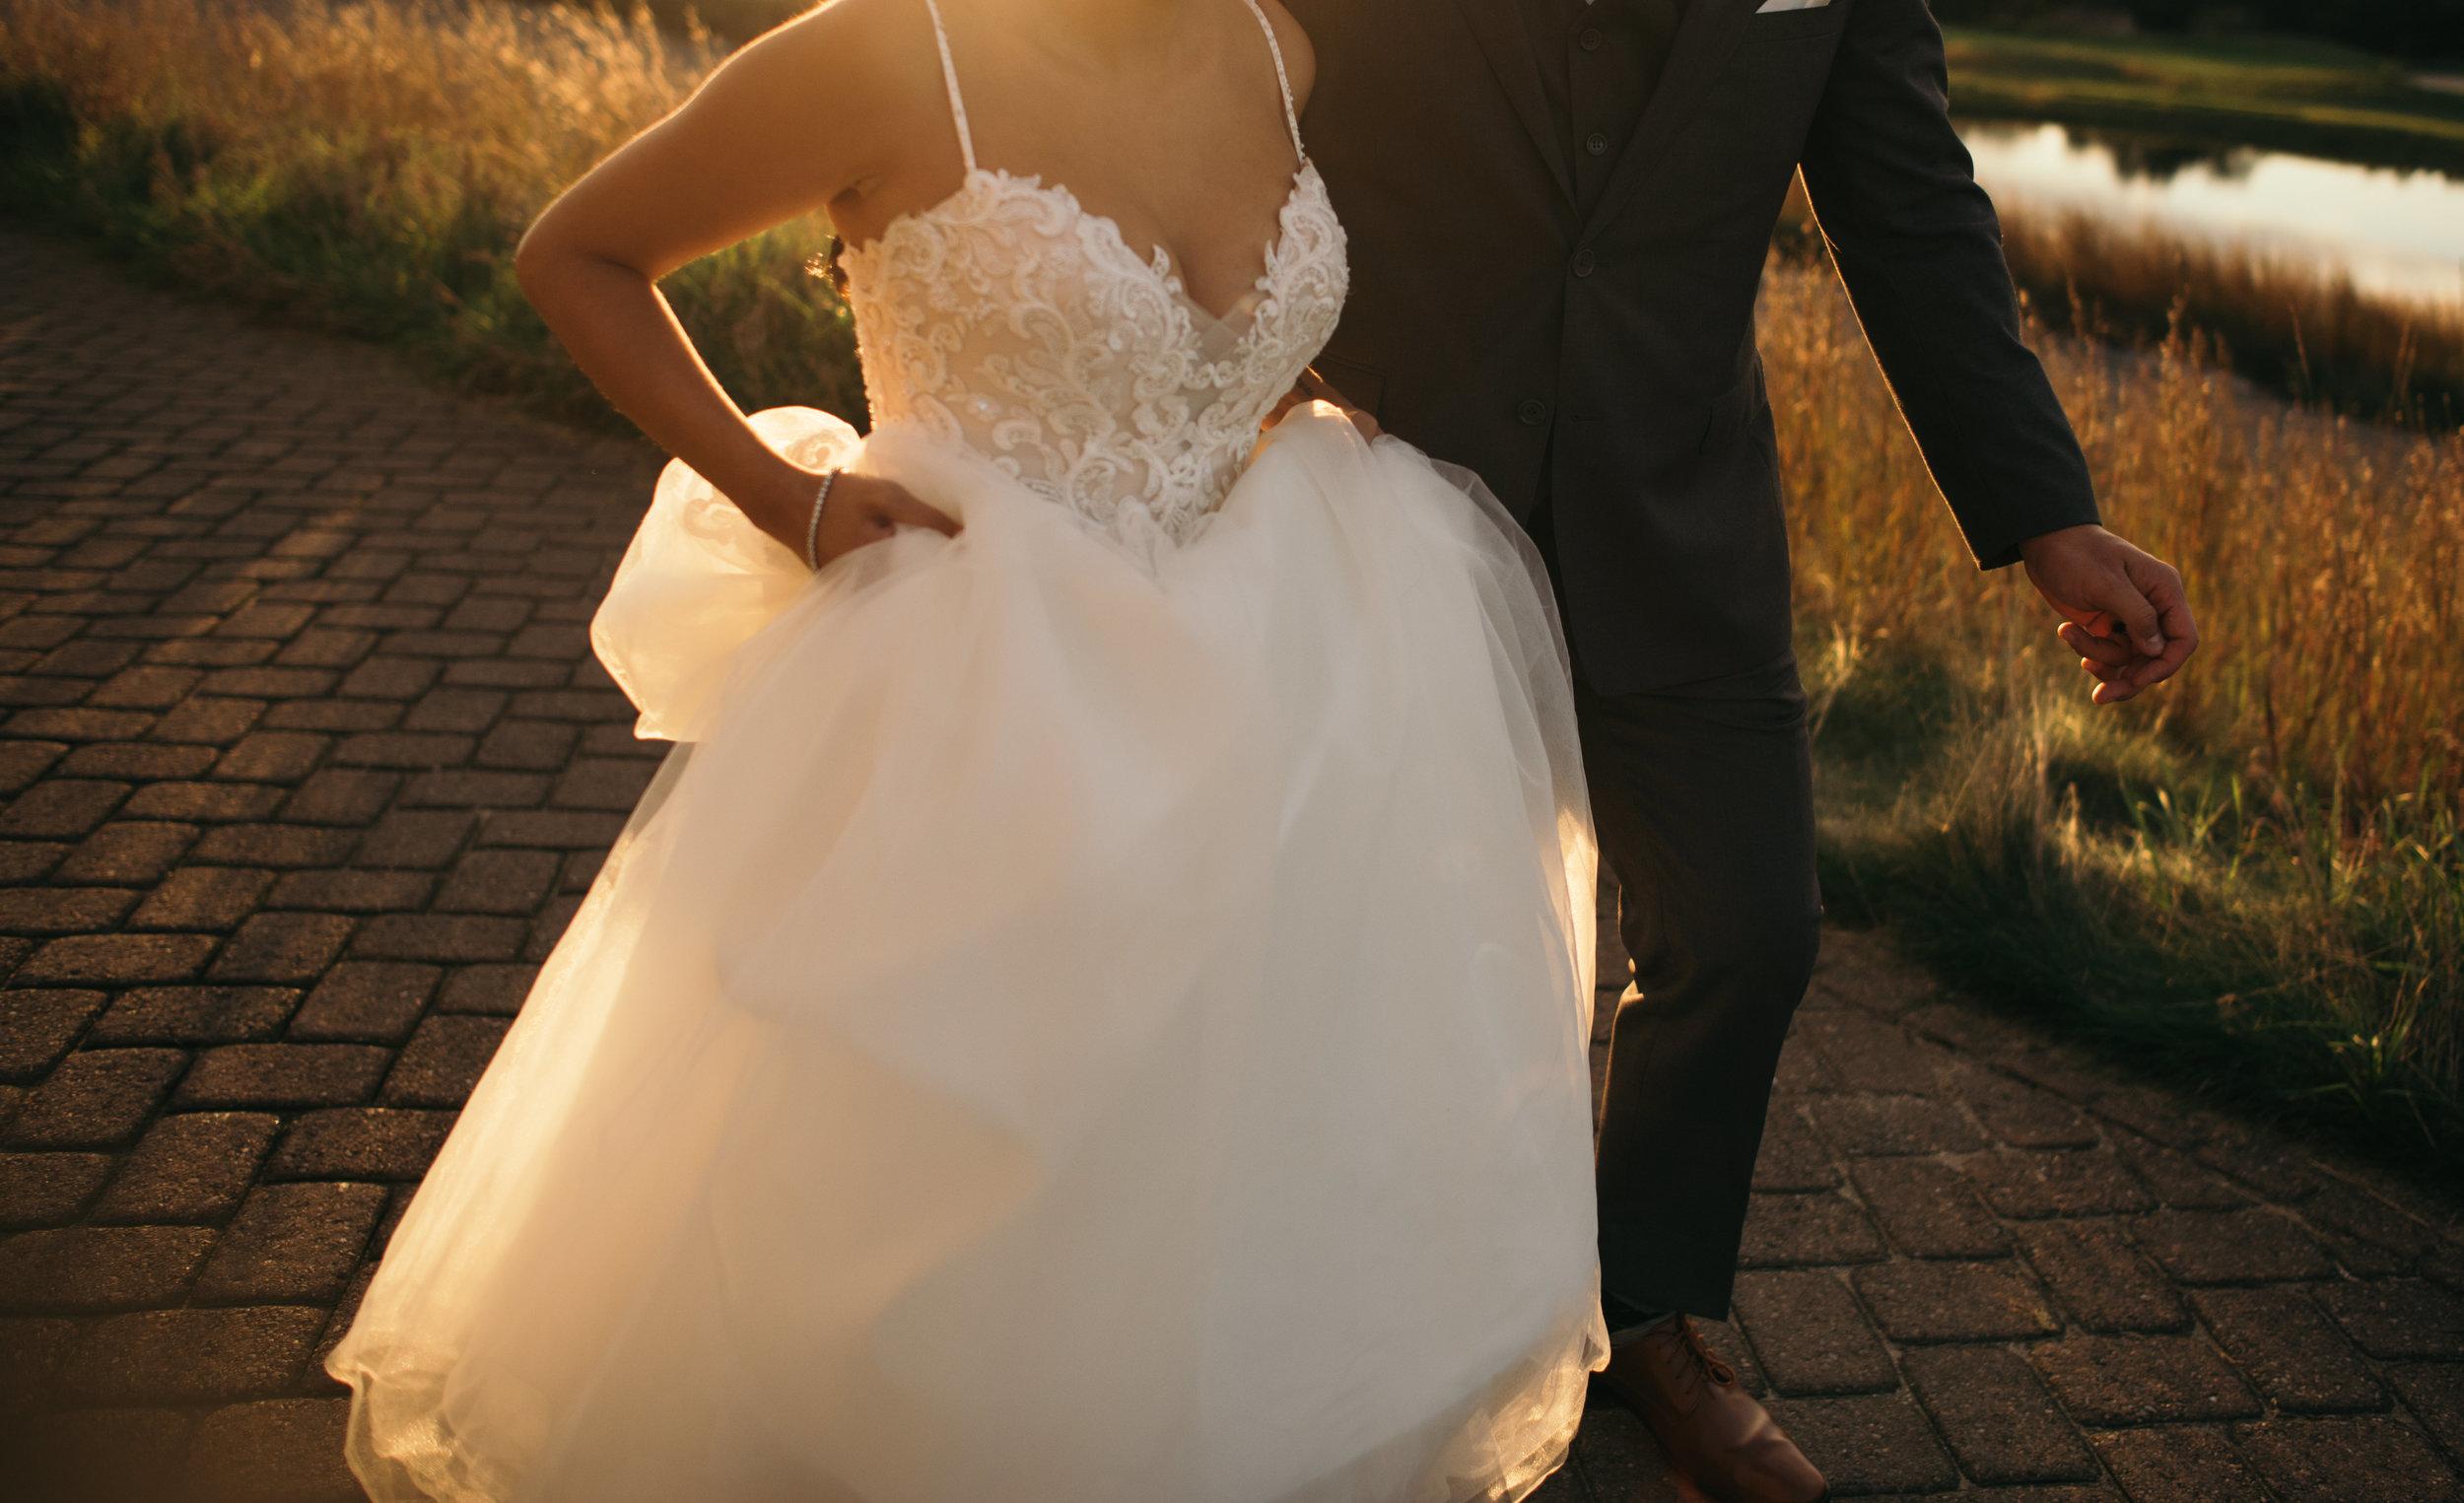 WeddingPhotos | NJPhotographer | Highlights-13-11.jpg